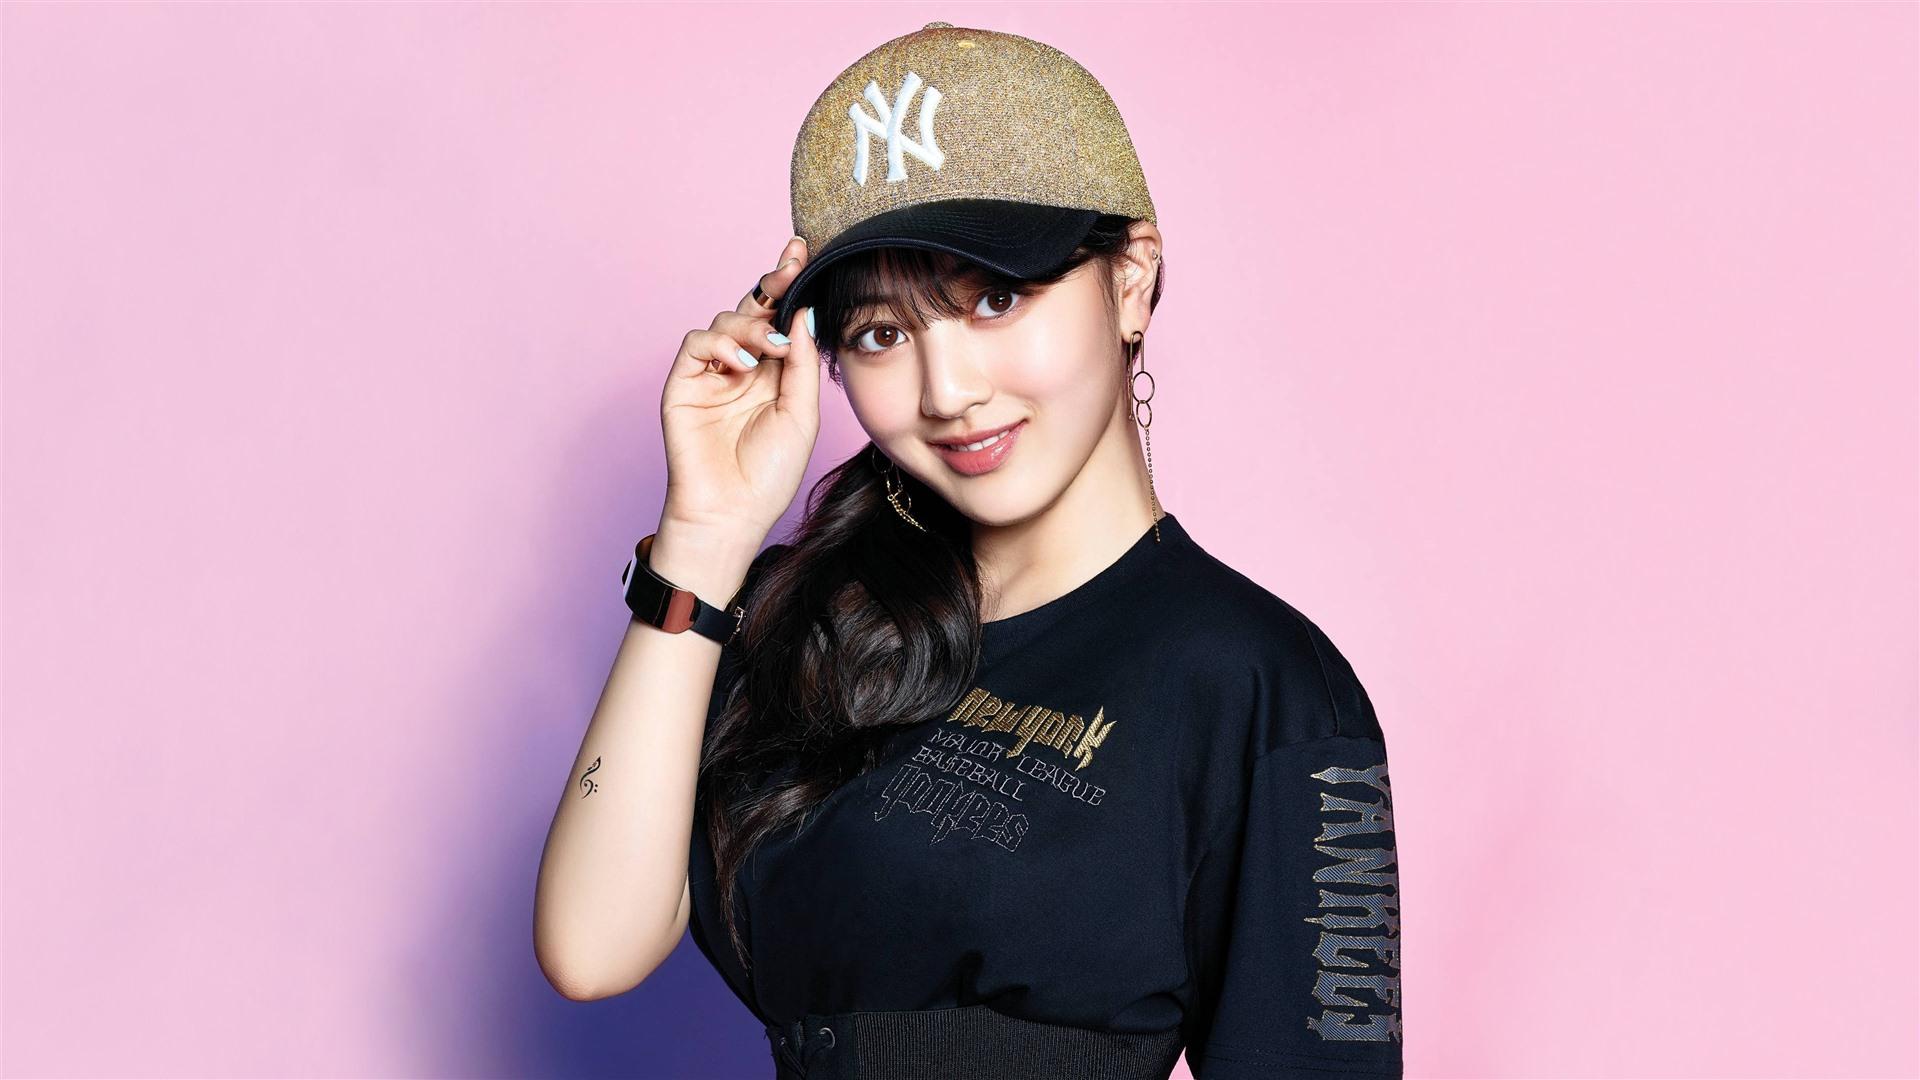 Wallpaper Jihyo, Twice, Korea girl 3840x2160 UHD 4K Picture